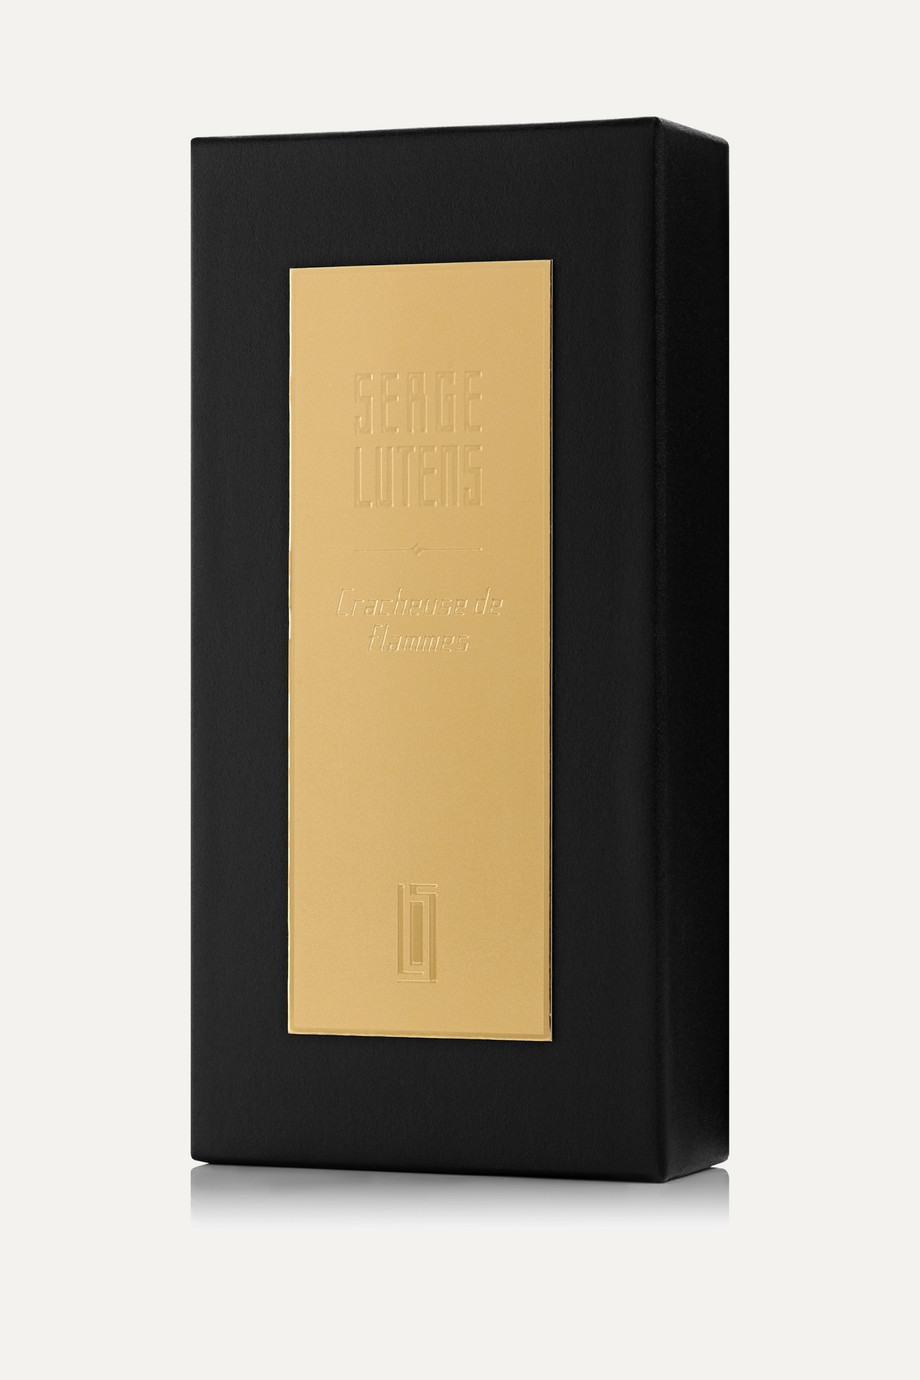 Serge Lutens Cracheuse de Flammes, 50 ml – Eau de Parfum